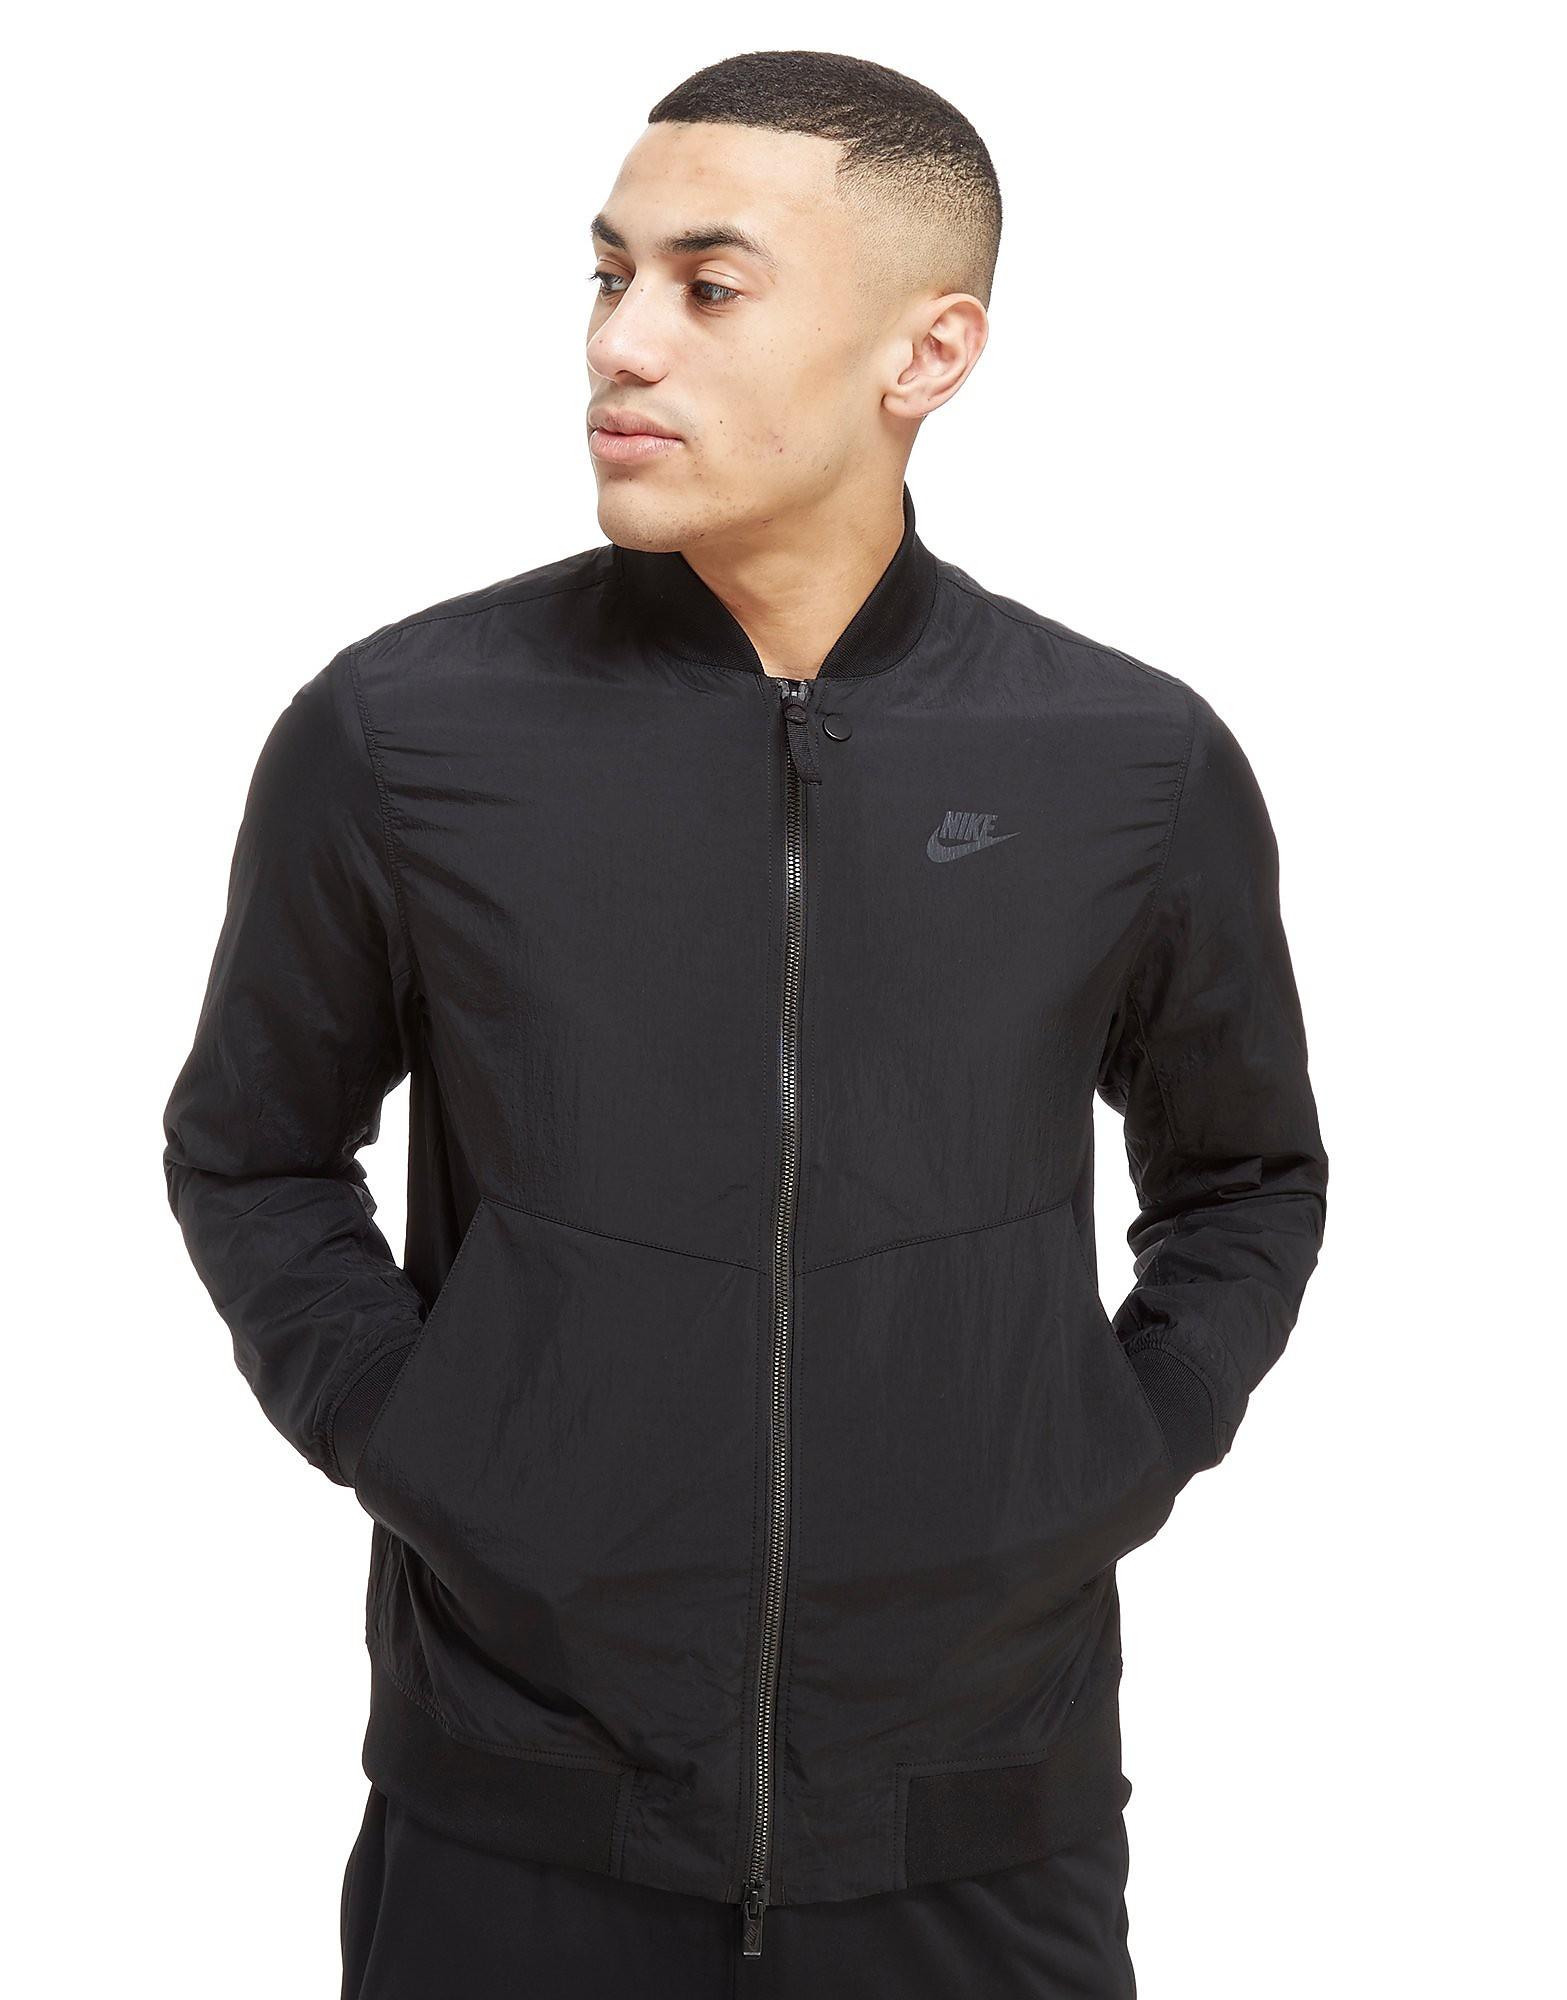 Nike Veste zippée Woven Varsity Homme